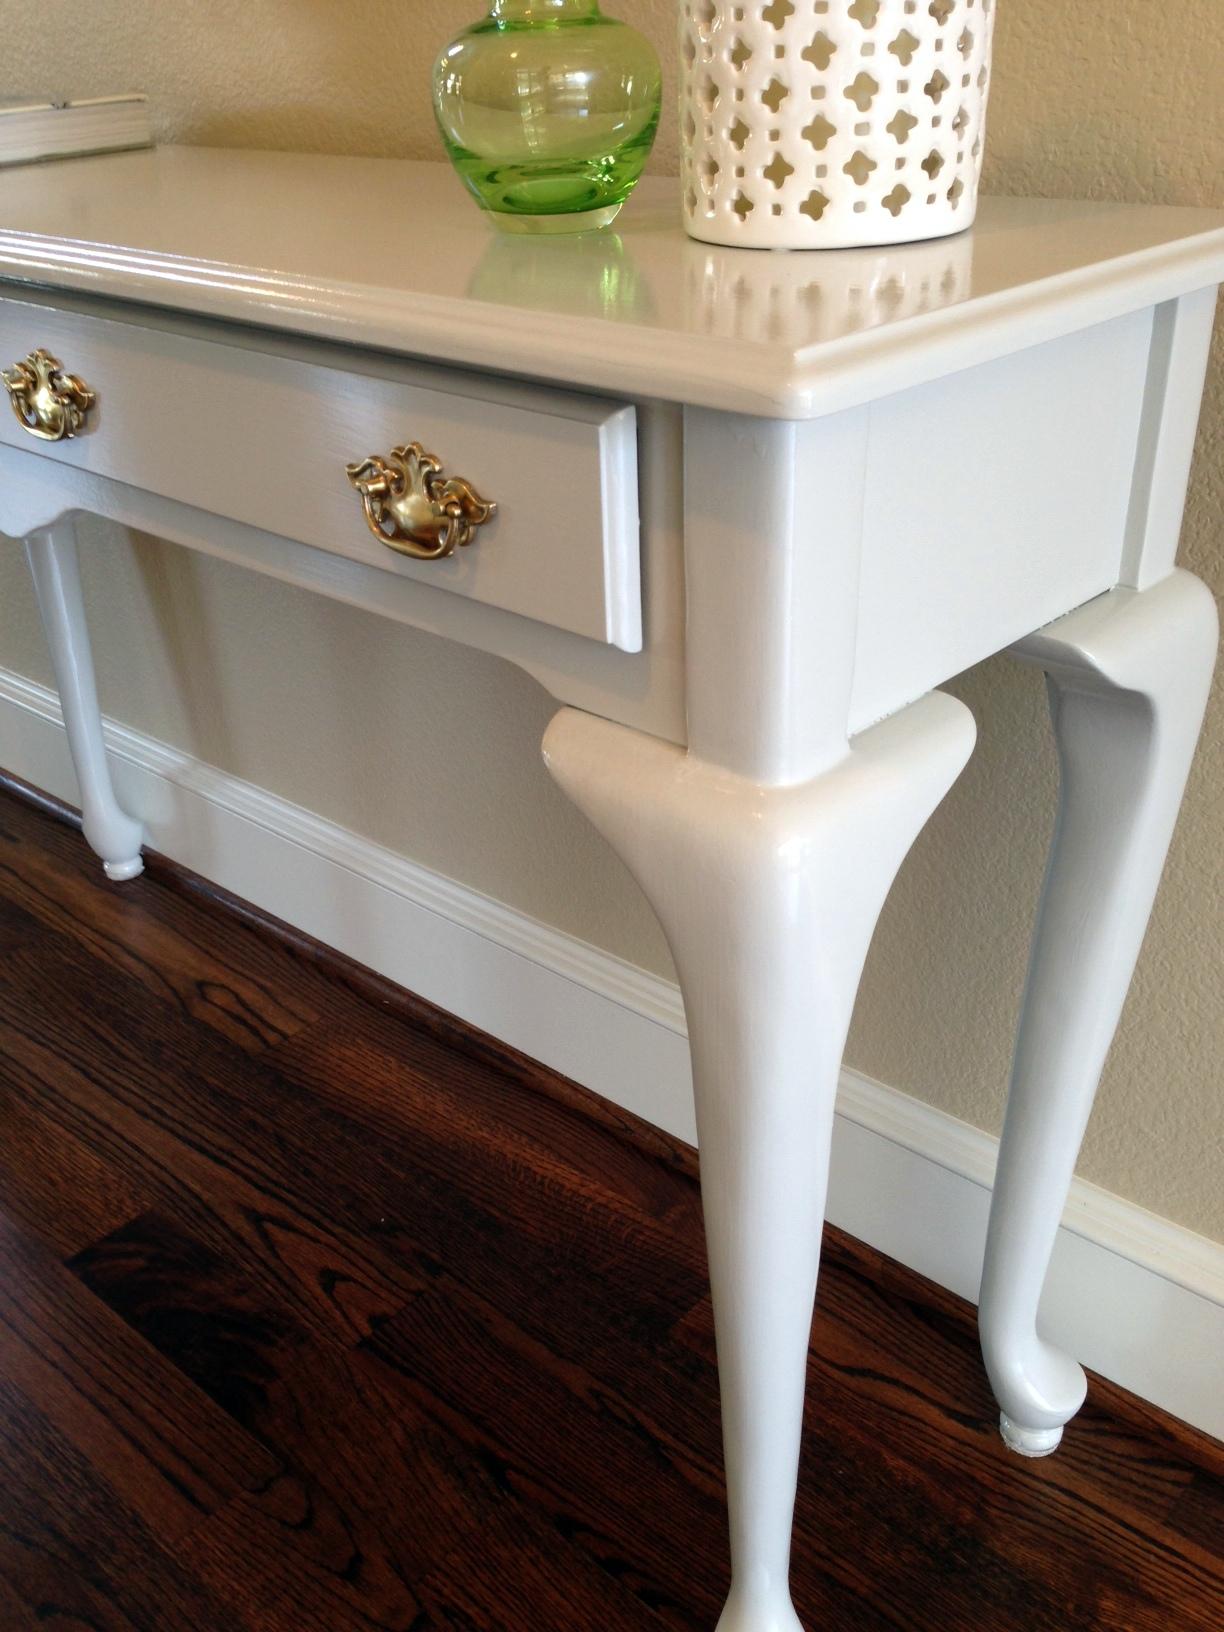 craigslist sacramento sofa table maroon colour leather restored  for sale a nester 39s nest